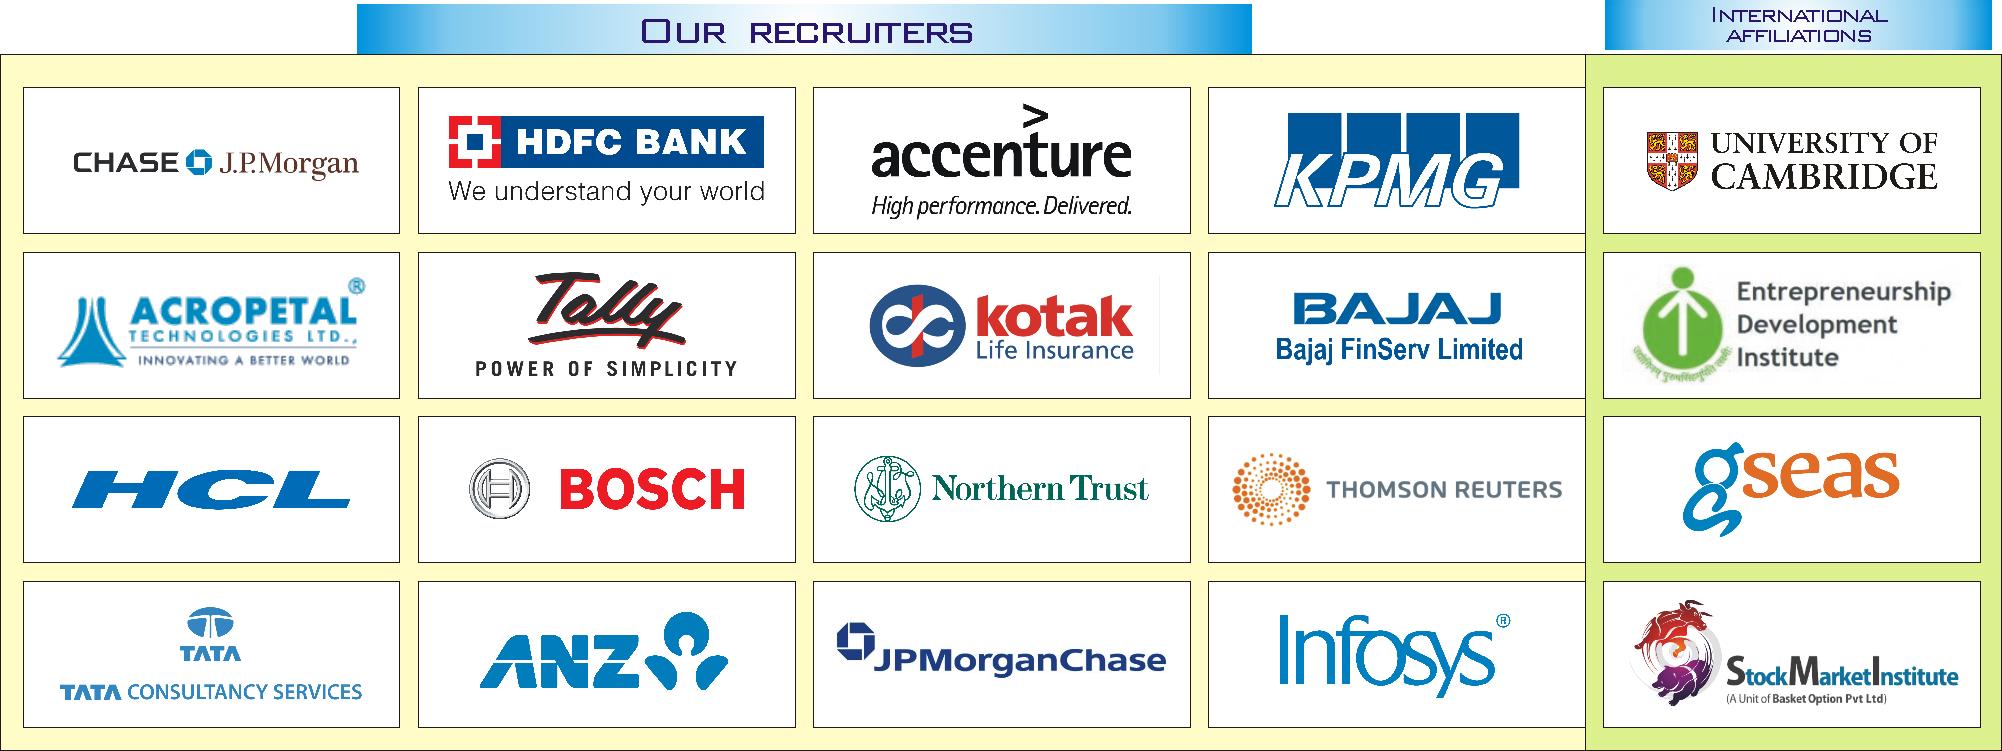 EWCM Bangalore MBA placement